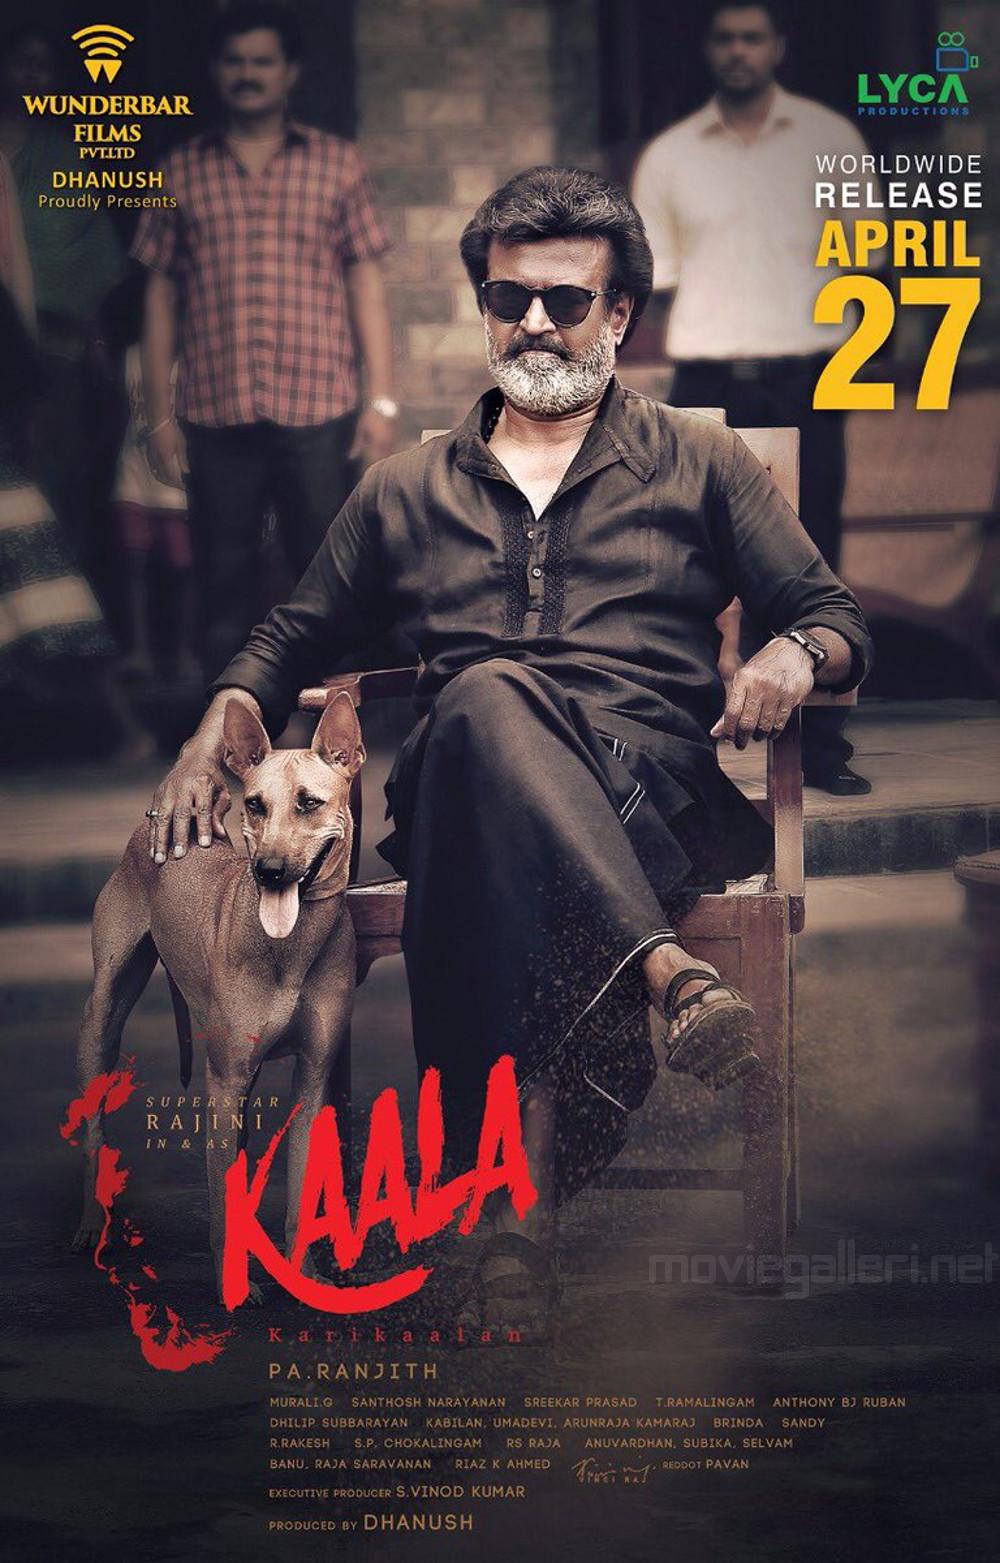 Rajini Kaala Movie Release Date April 27th Poster